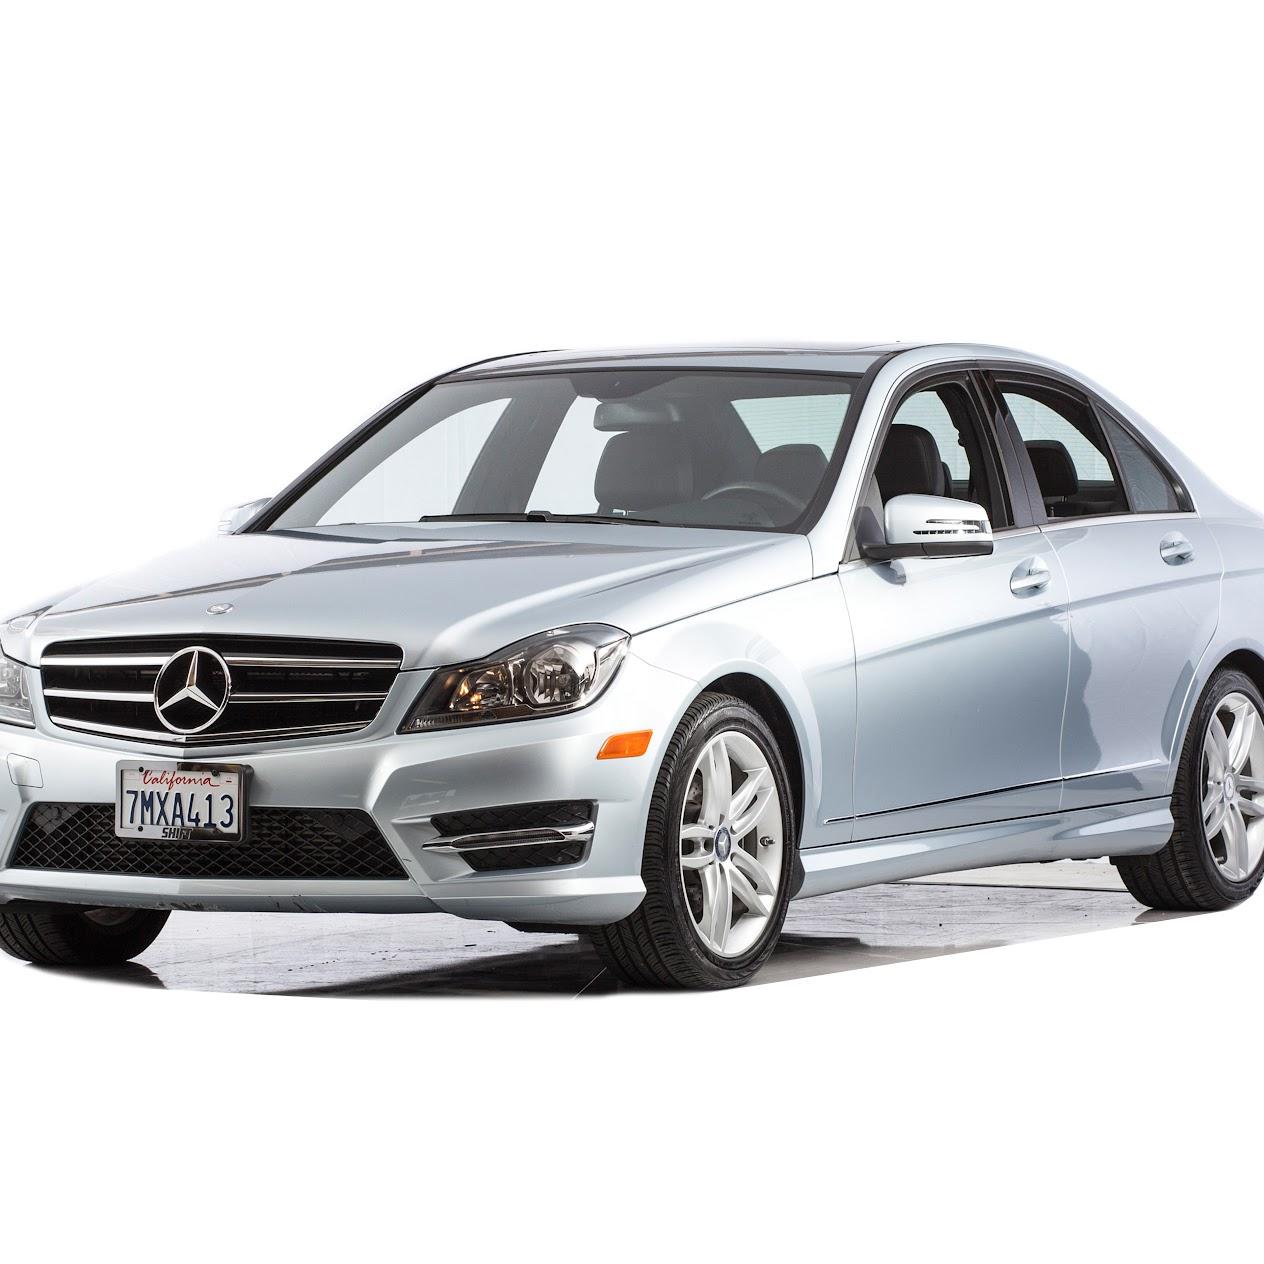 Mercedes Benz C Class In San Francisco Drive Local Shift